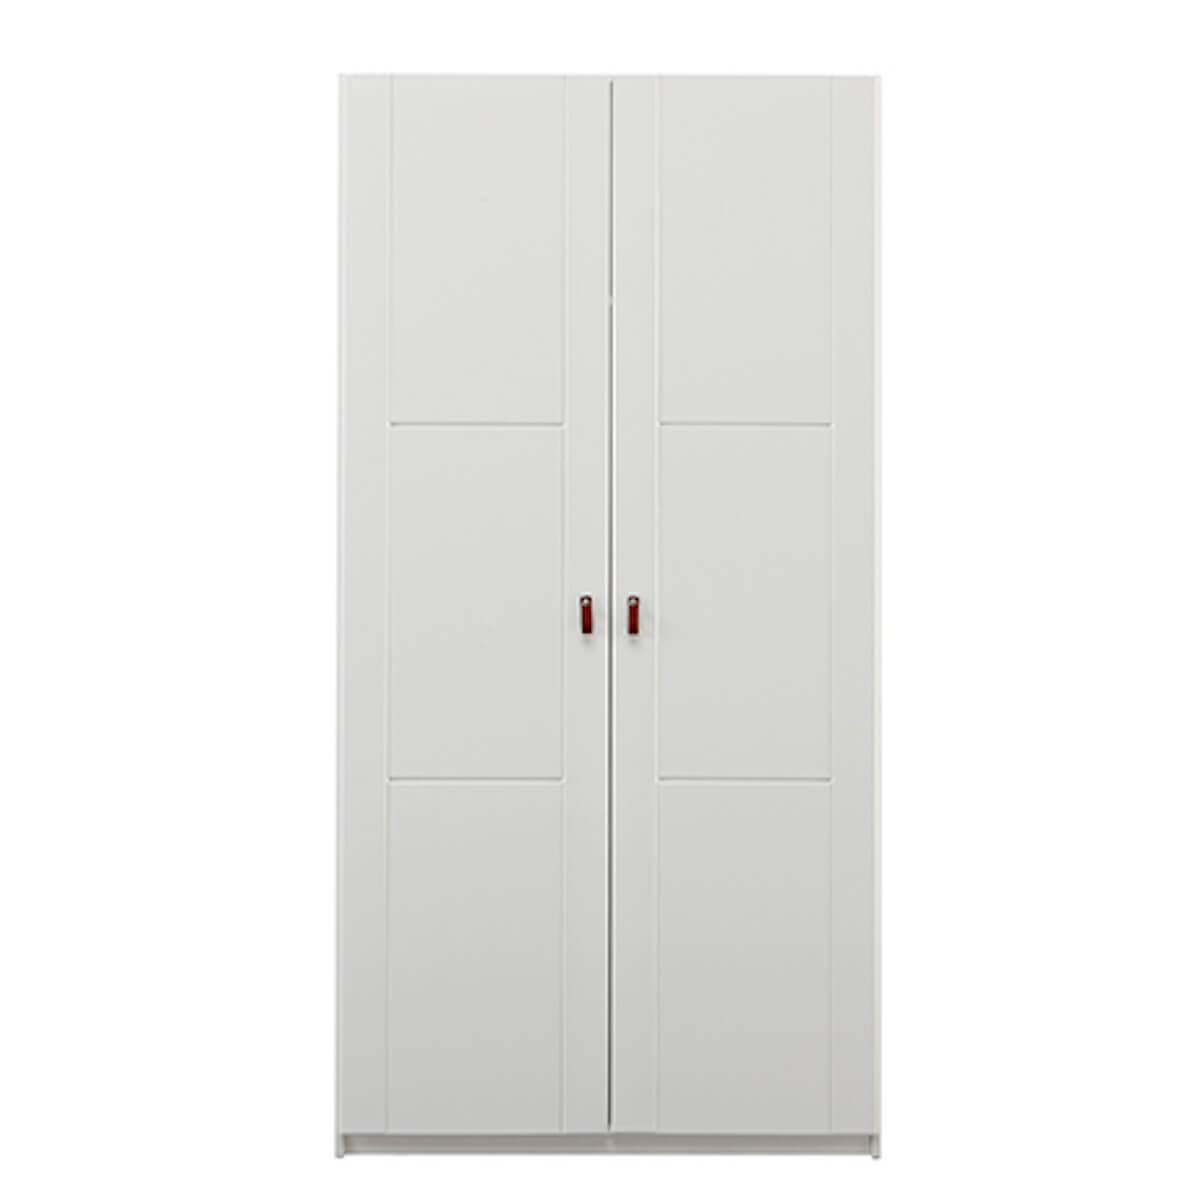 Armario 2 puertas sin tiradores Lifetime blanco